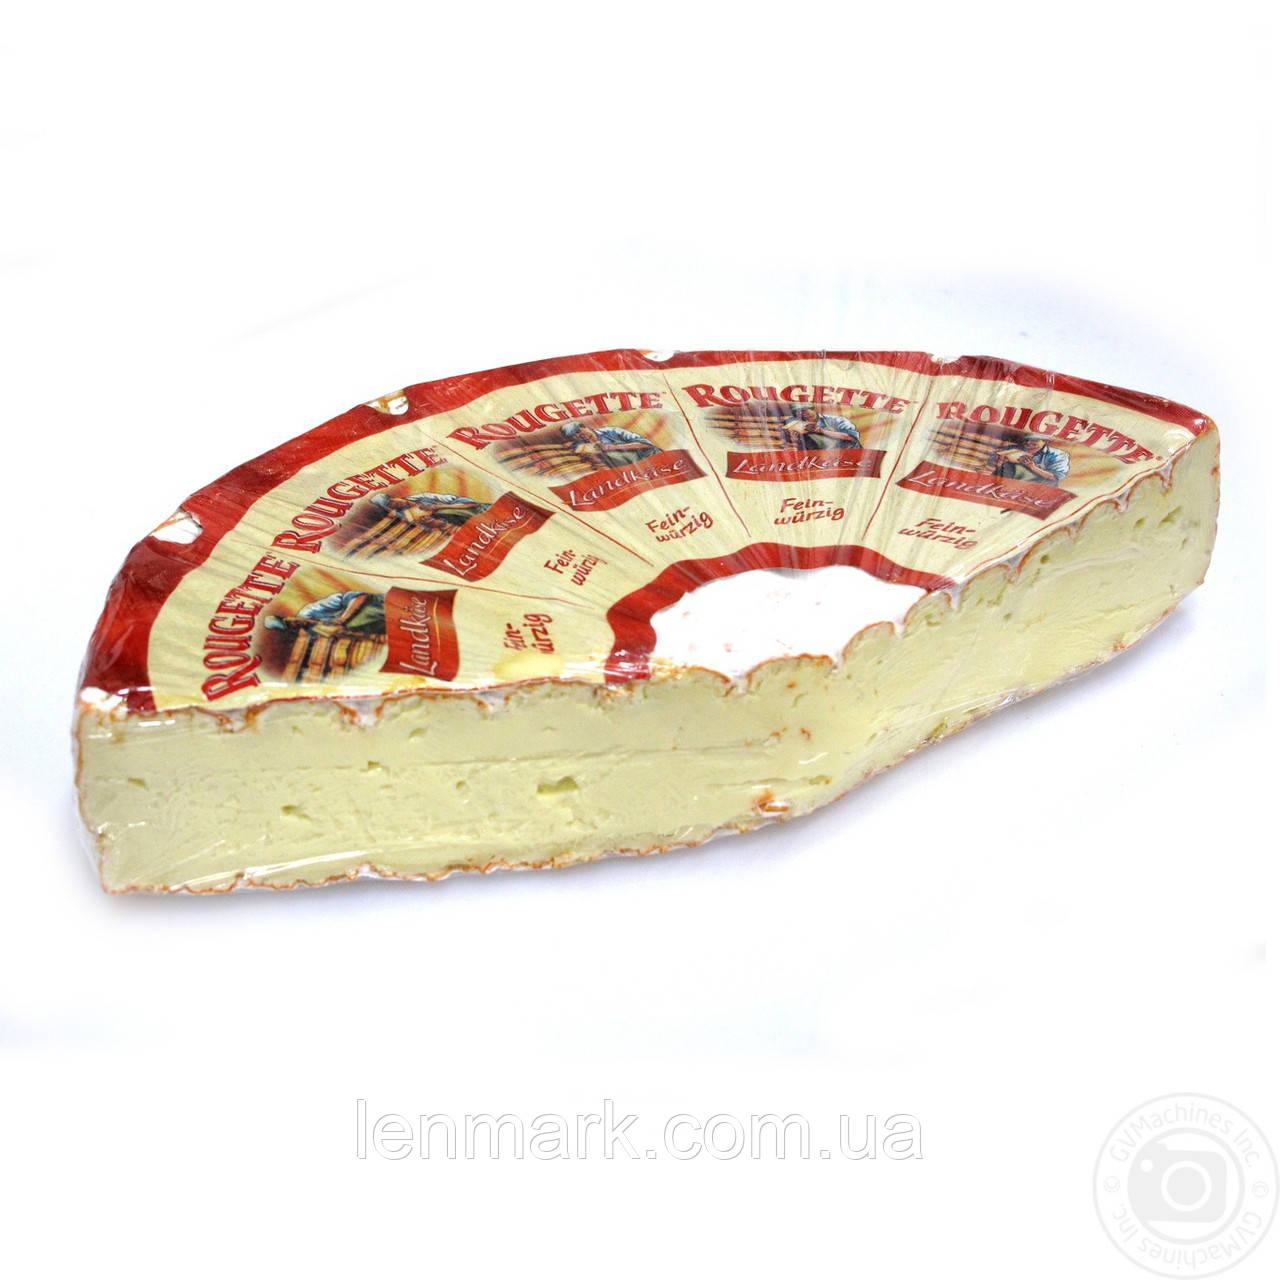 Сыр с красно-белой корочкой Rougette Kaserei Champignon РУЖЕТТ  70%